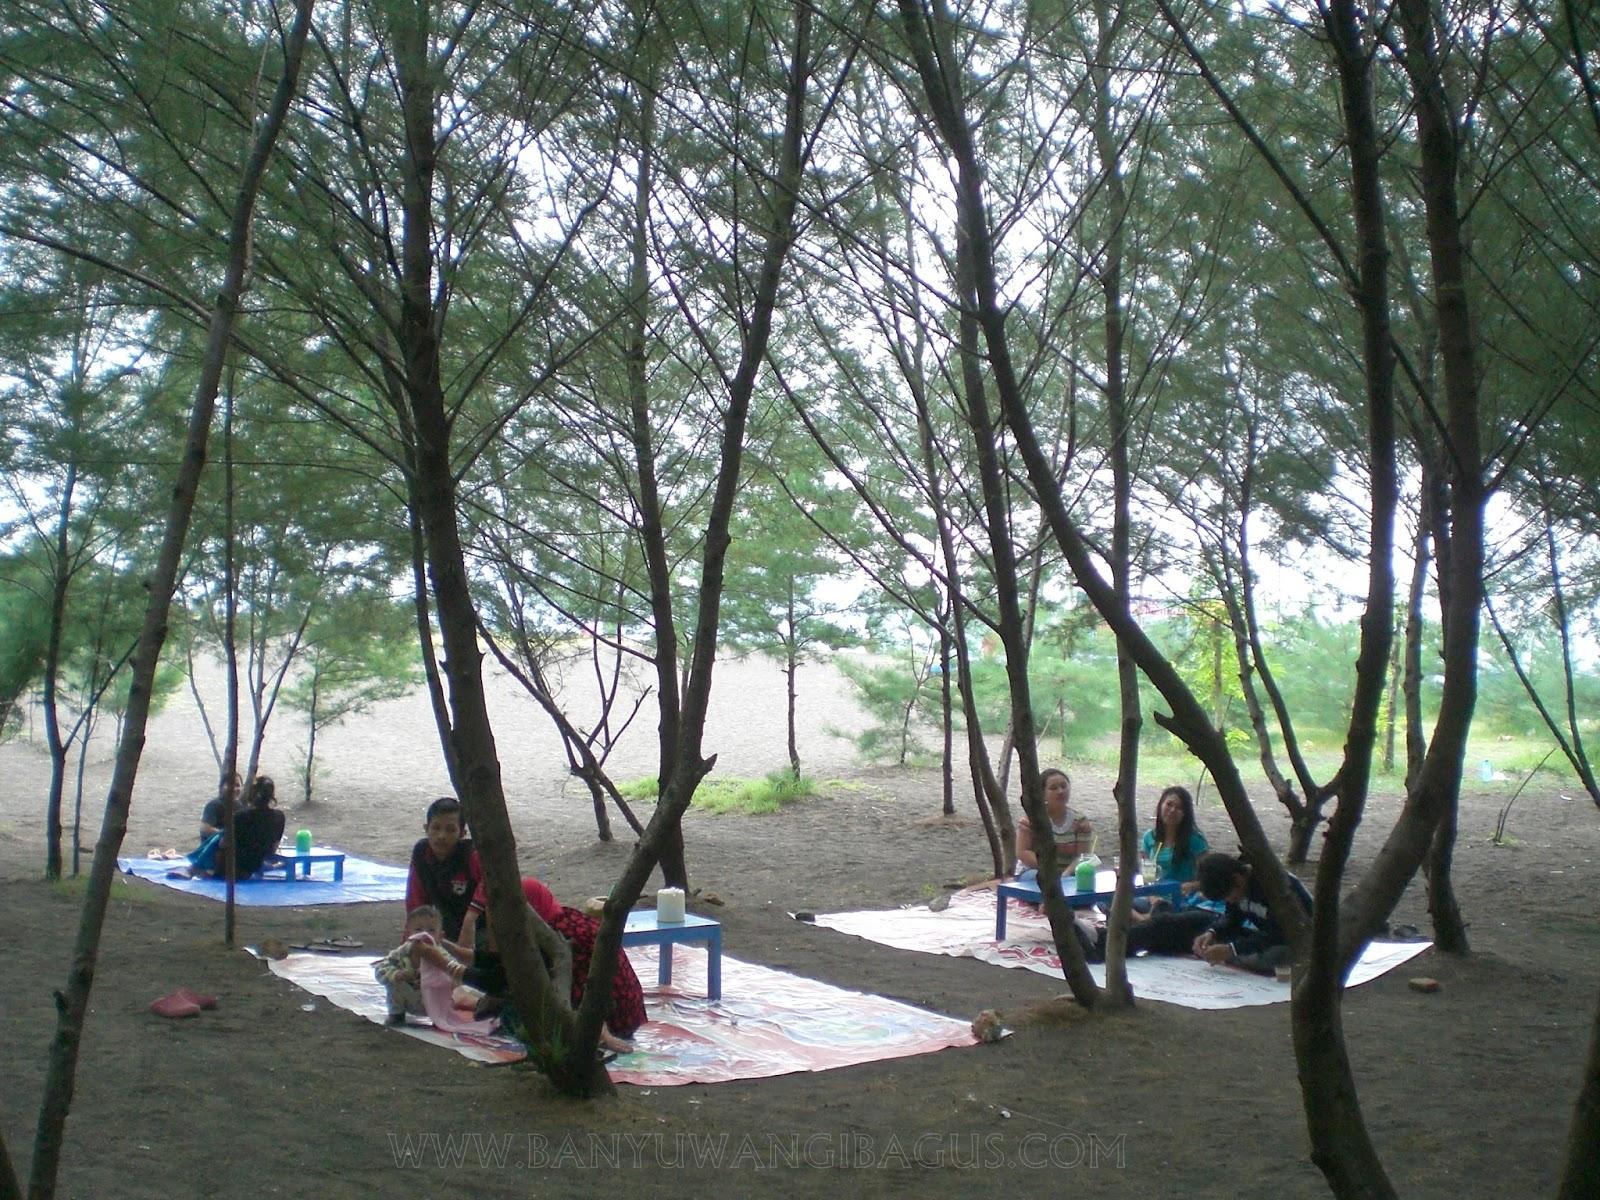 Lorong Hutan Pantai Cemara Banyuwangi Bagus Berada Bawah Pohon Rindang